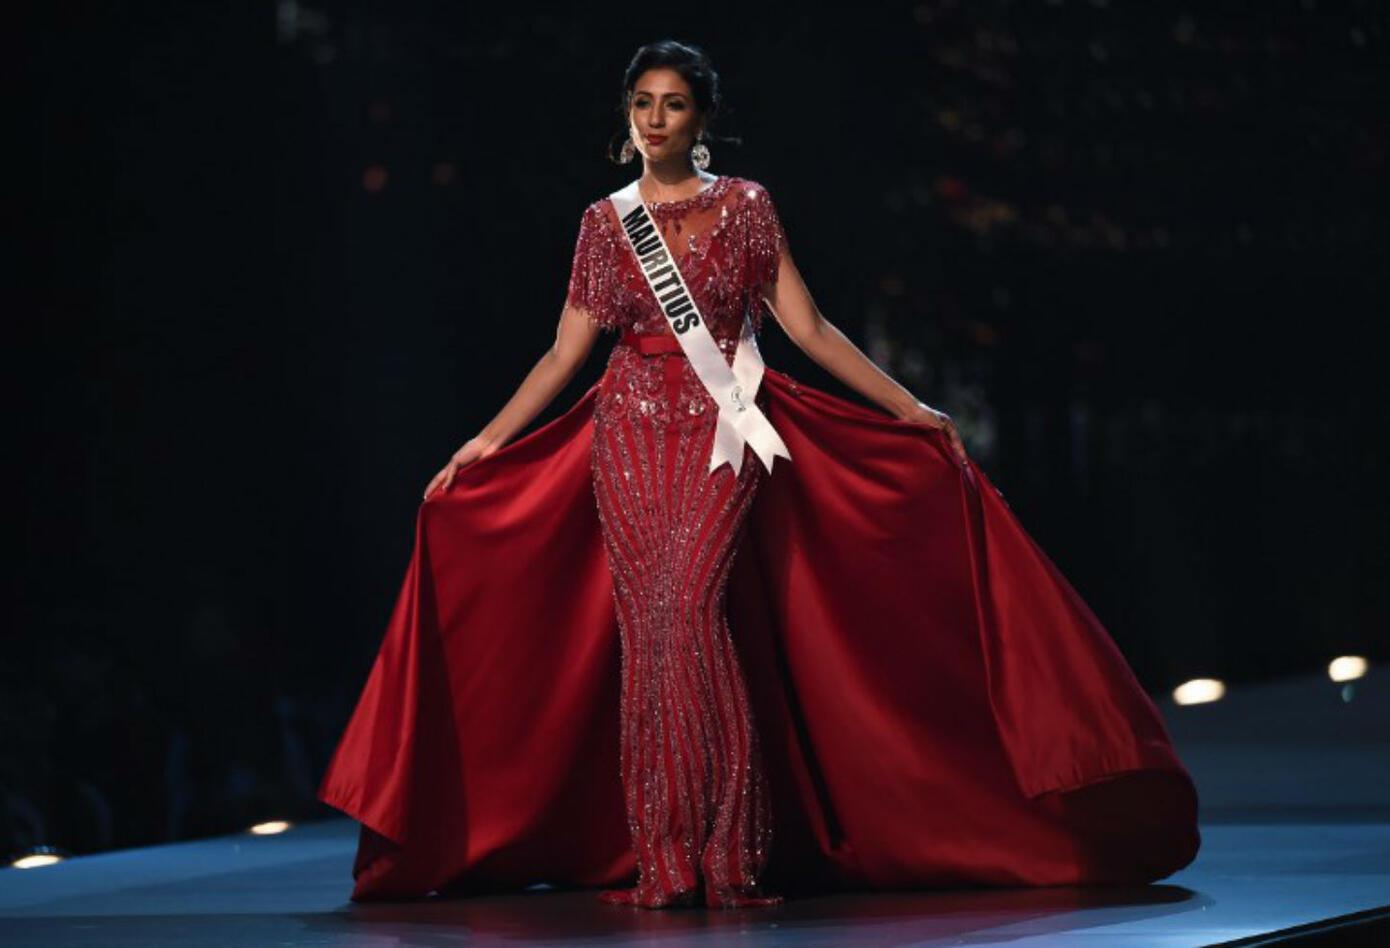 Miss Mauritius, Varsha Ragoobarsing